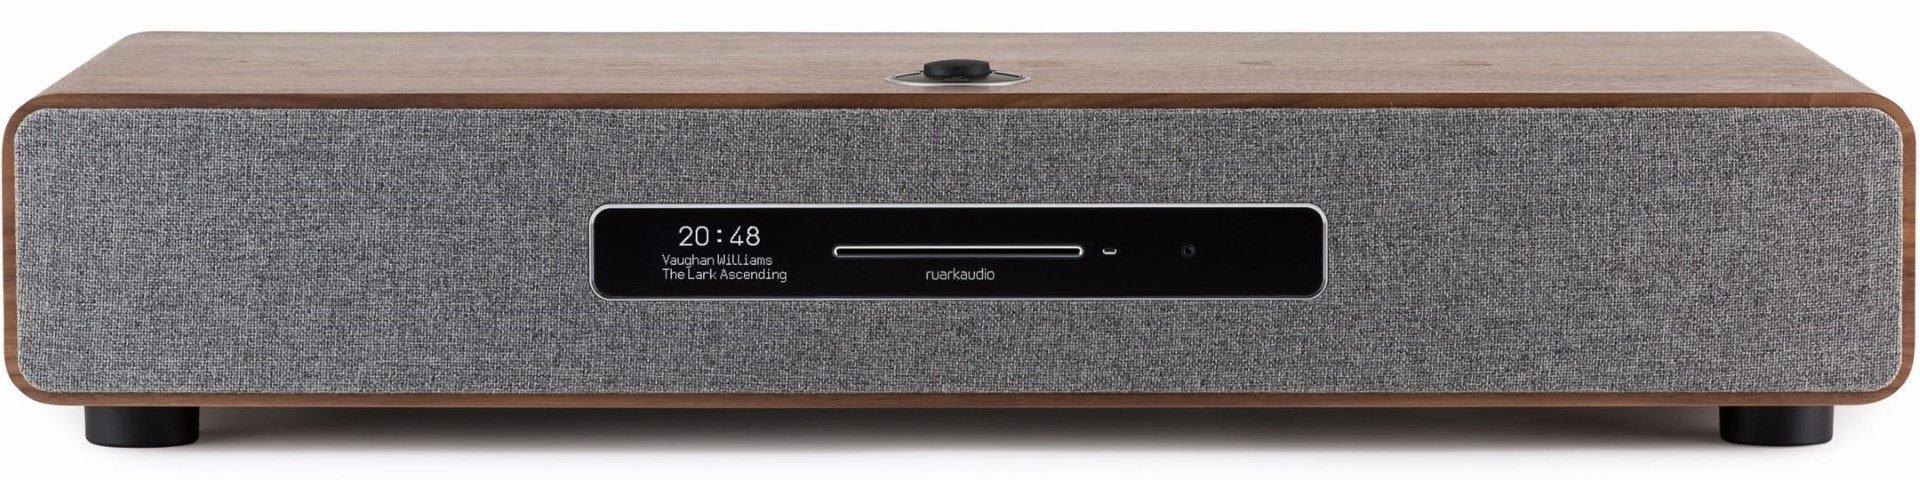 Ruark Audio R7Mk3 - Toimitus 0€ - HIFIKULMA